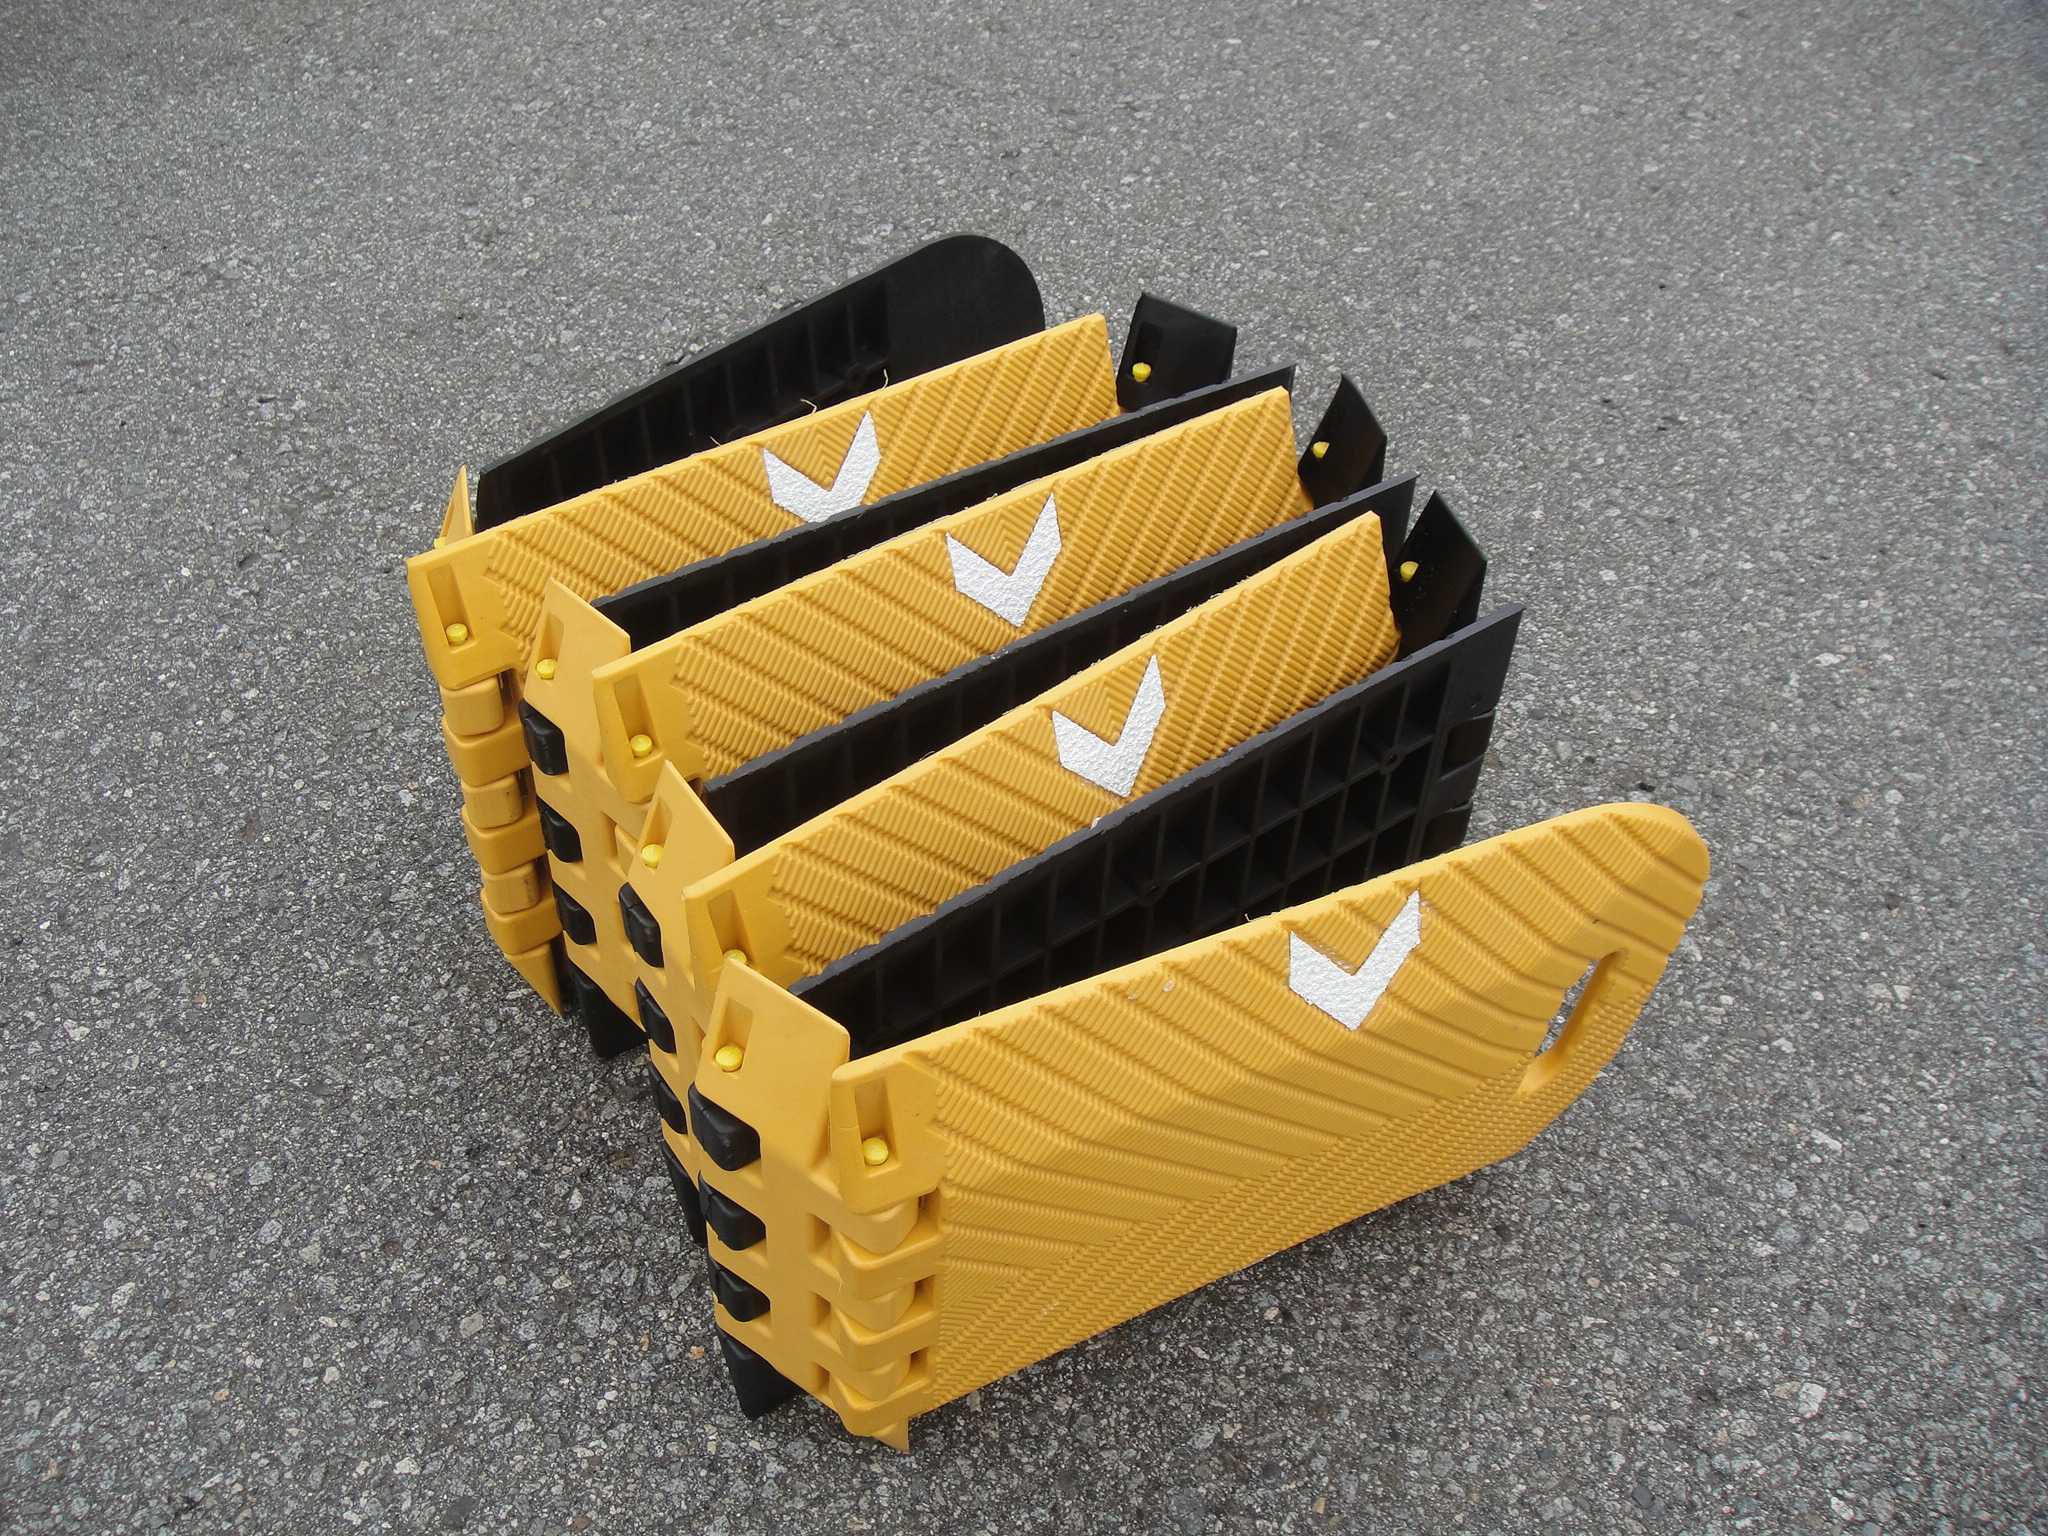 樹脂製折り畳み式簡易減速帯